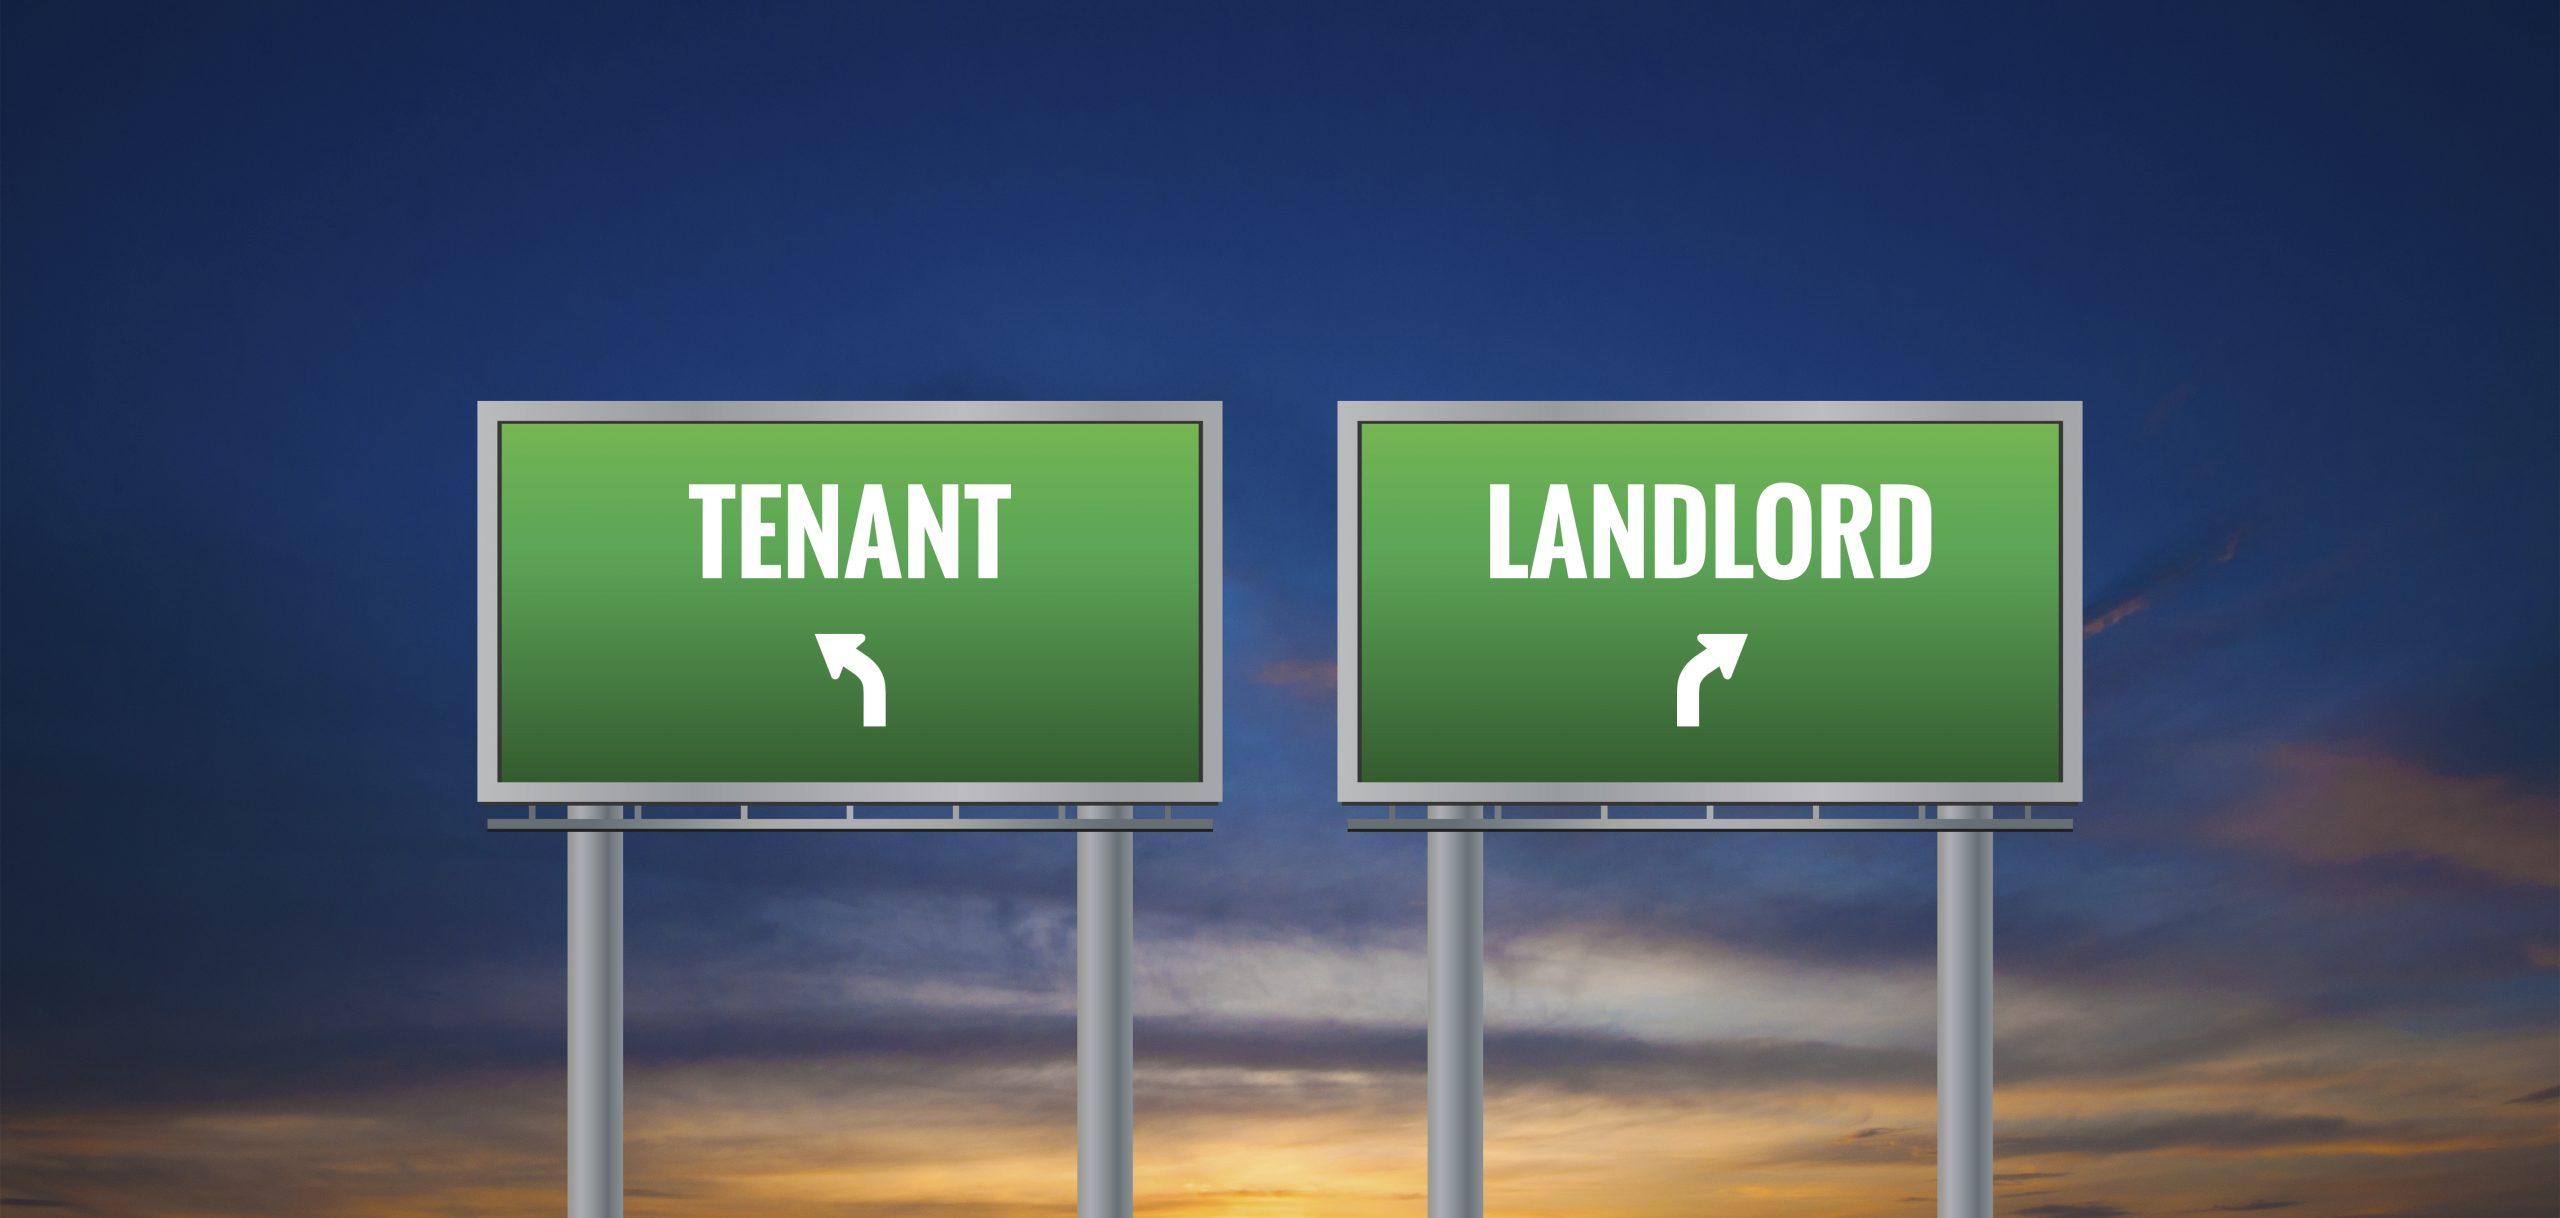 UK Landlord reviews on Asktenants.co.uk